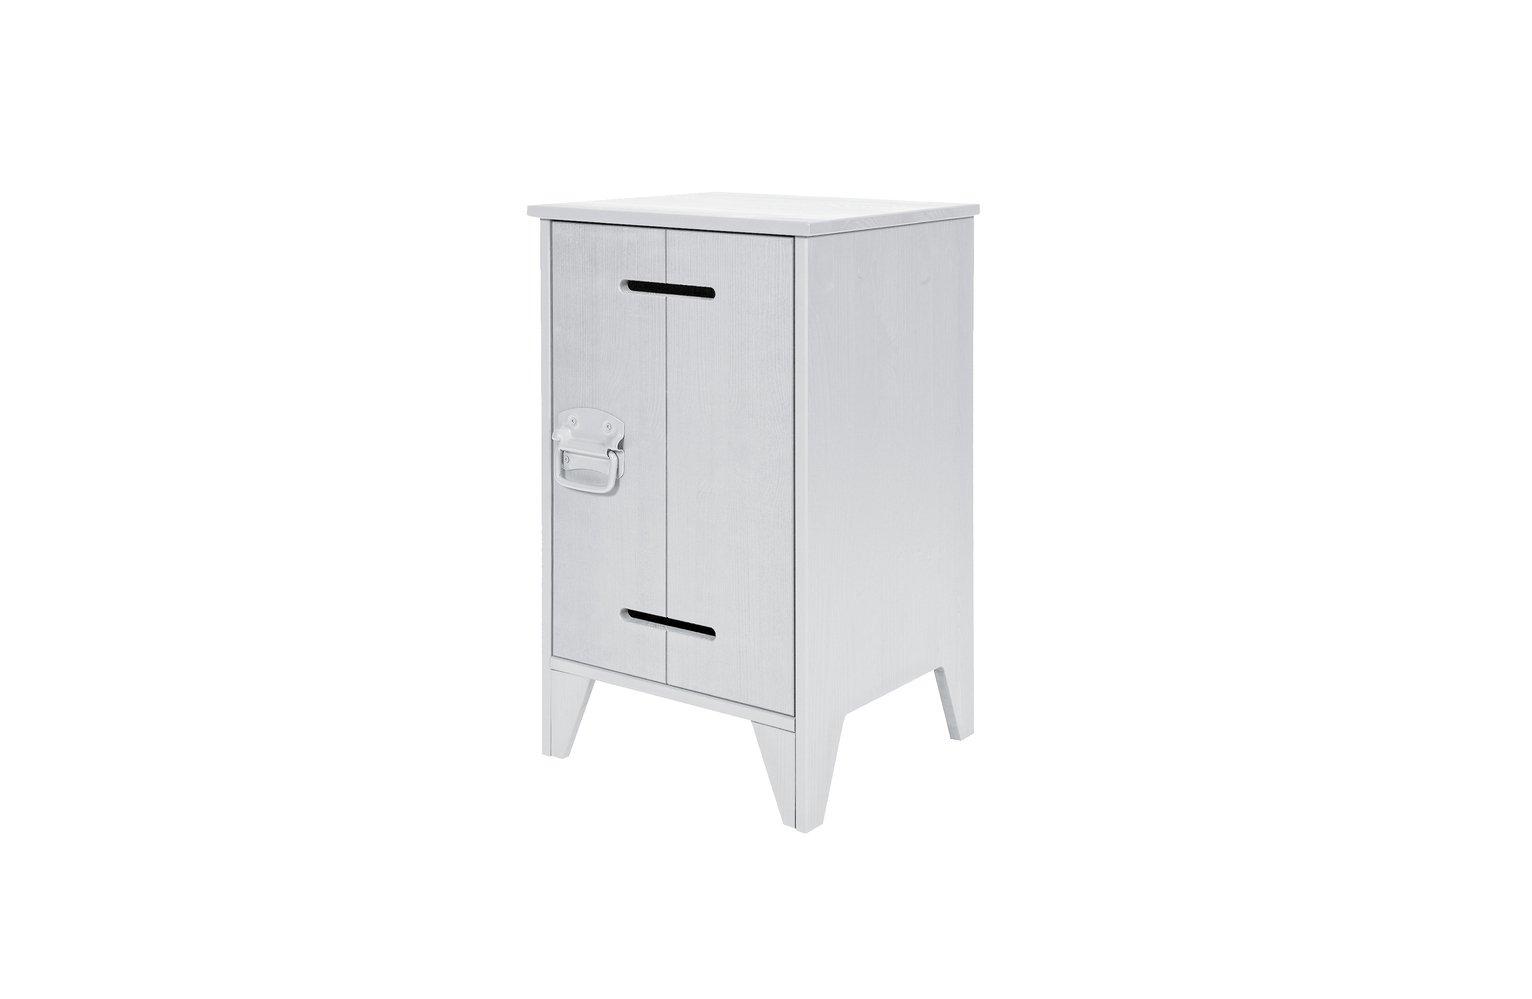 Woood Kluis Concrete Grey Bedside Cabinet